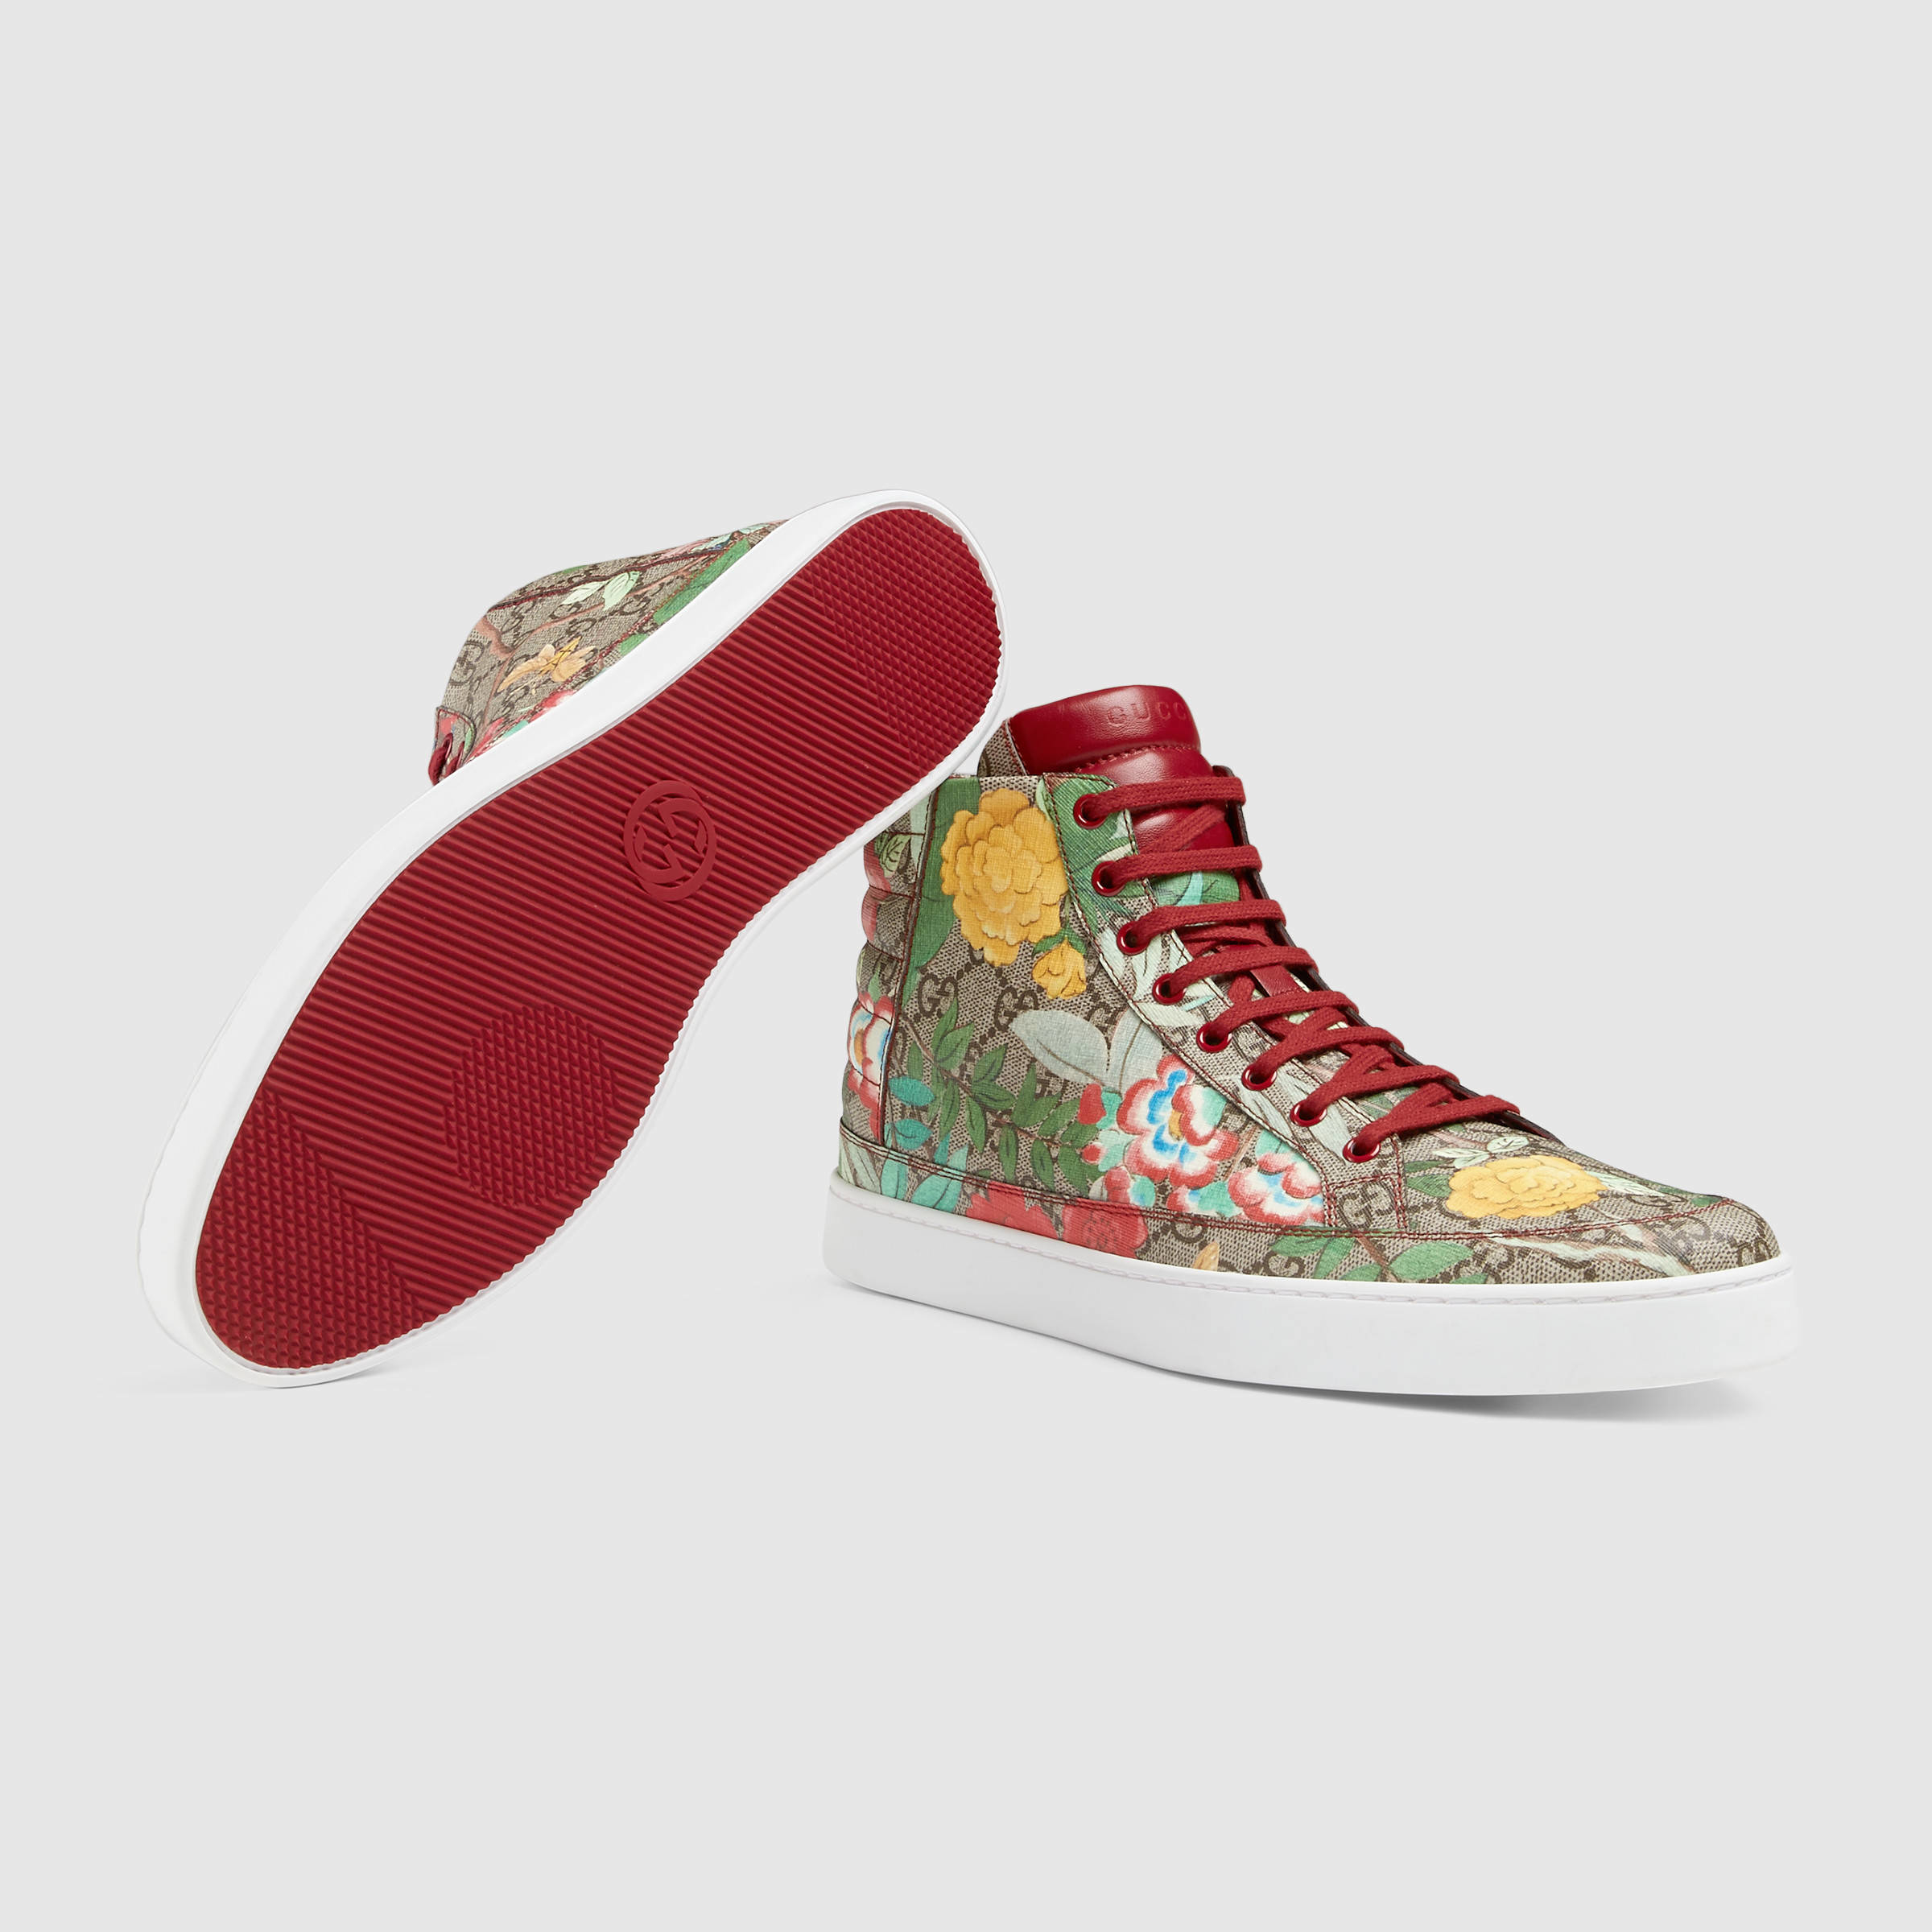 807431d73c04 Lyst - Gucci Men s Tian High-top Sneaker for Men